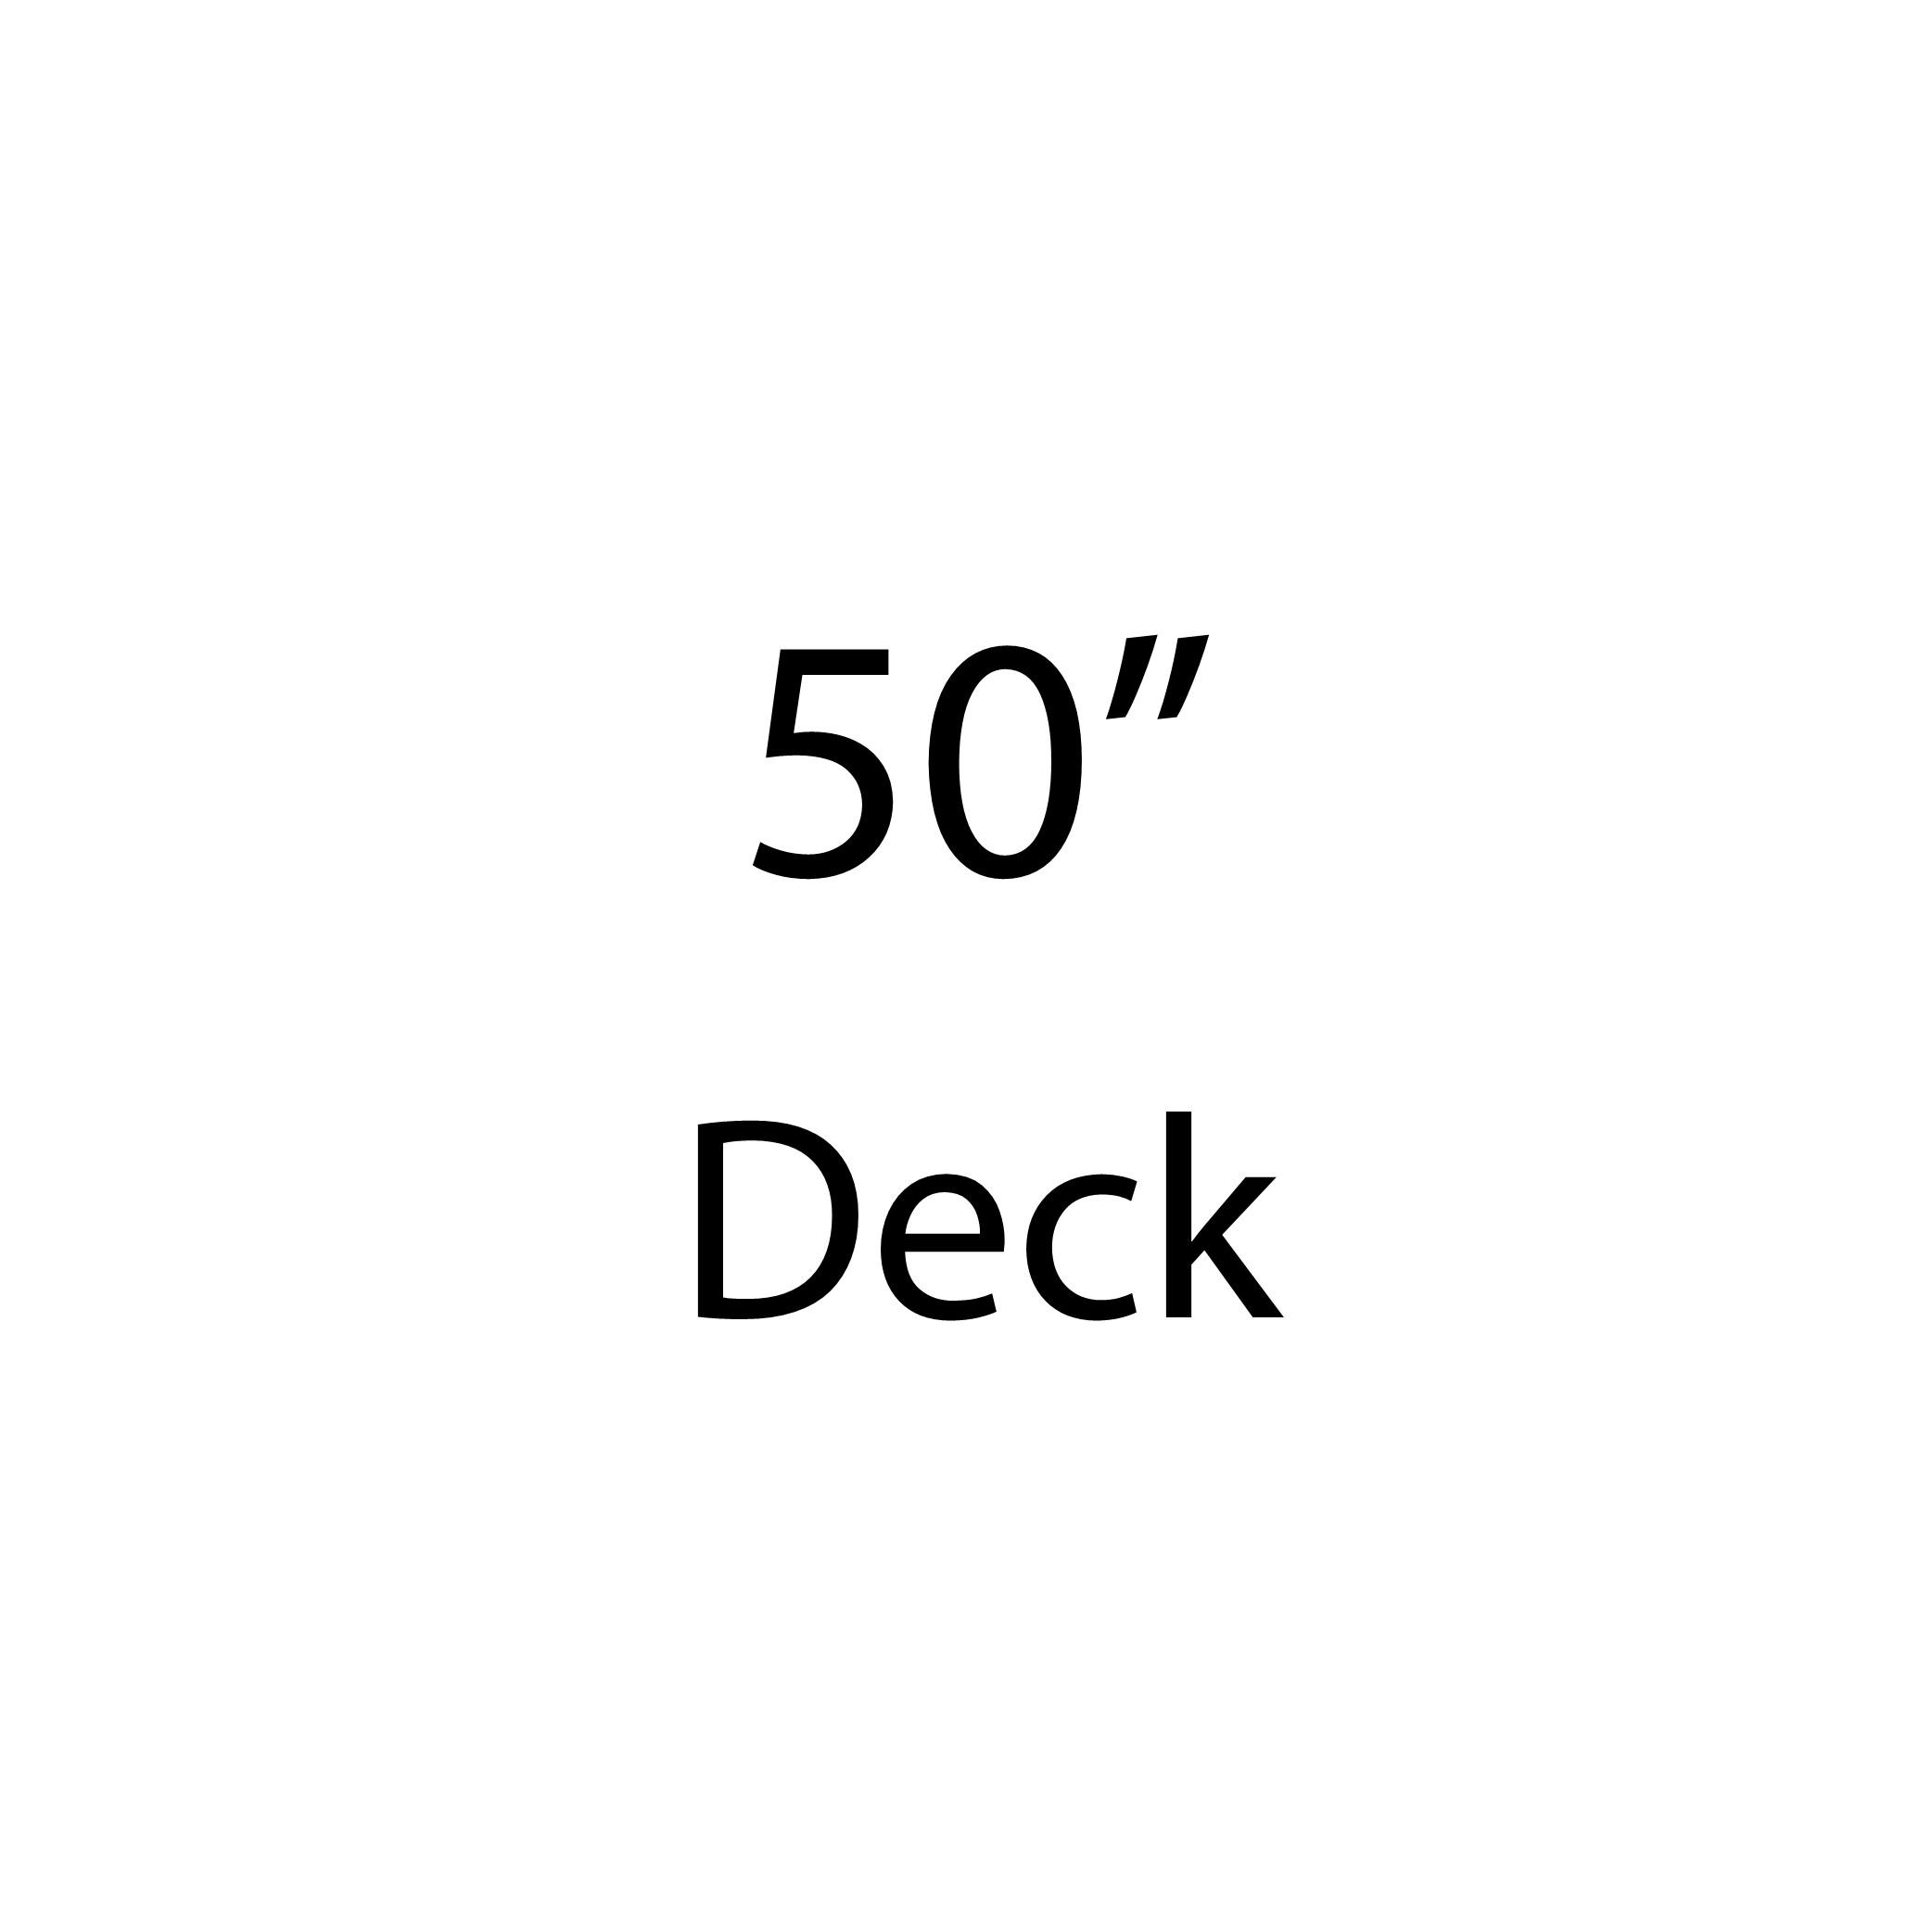 "50"" Deck"